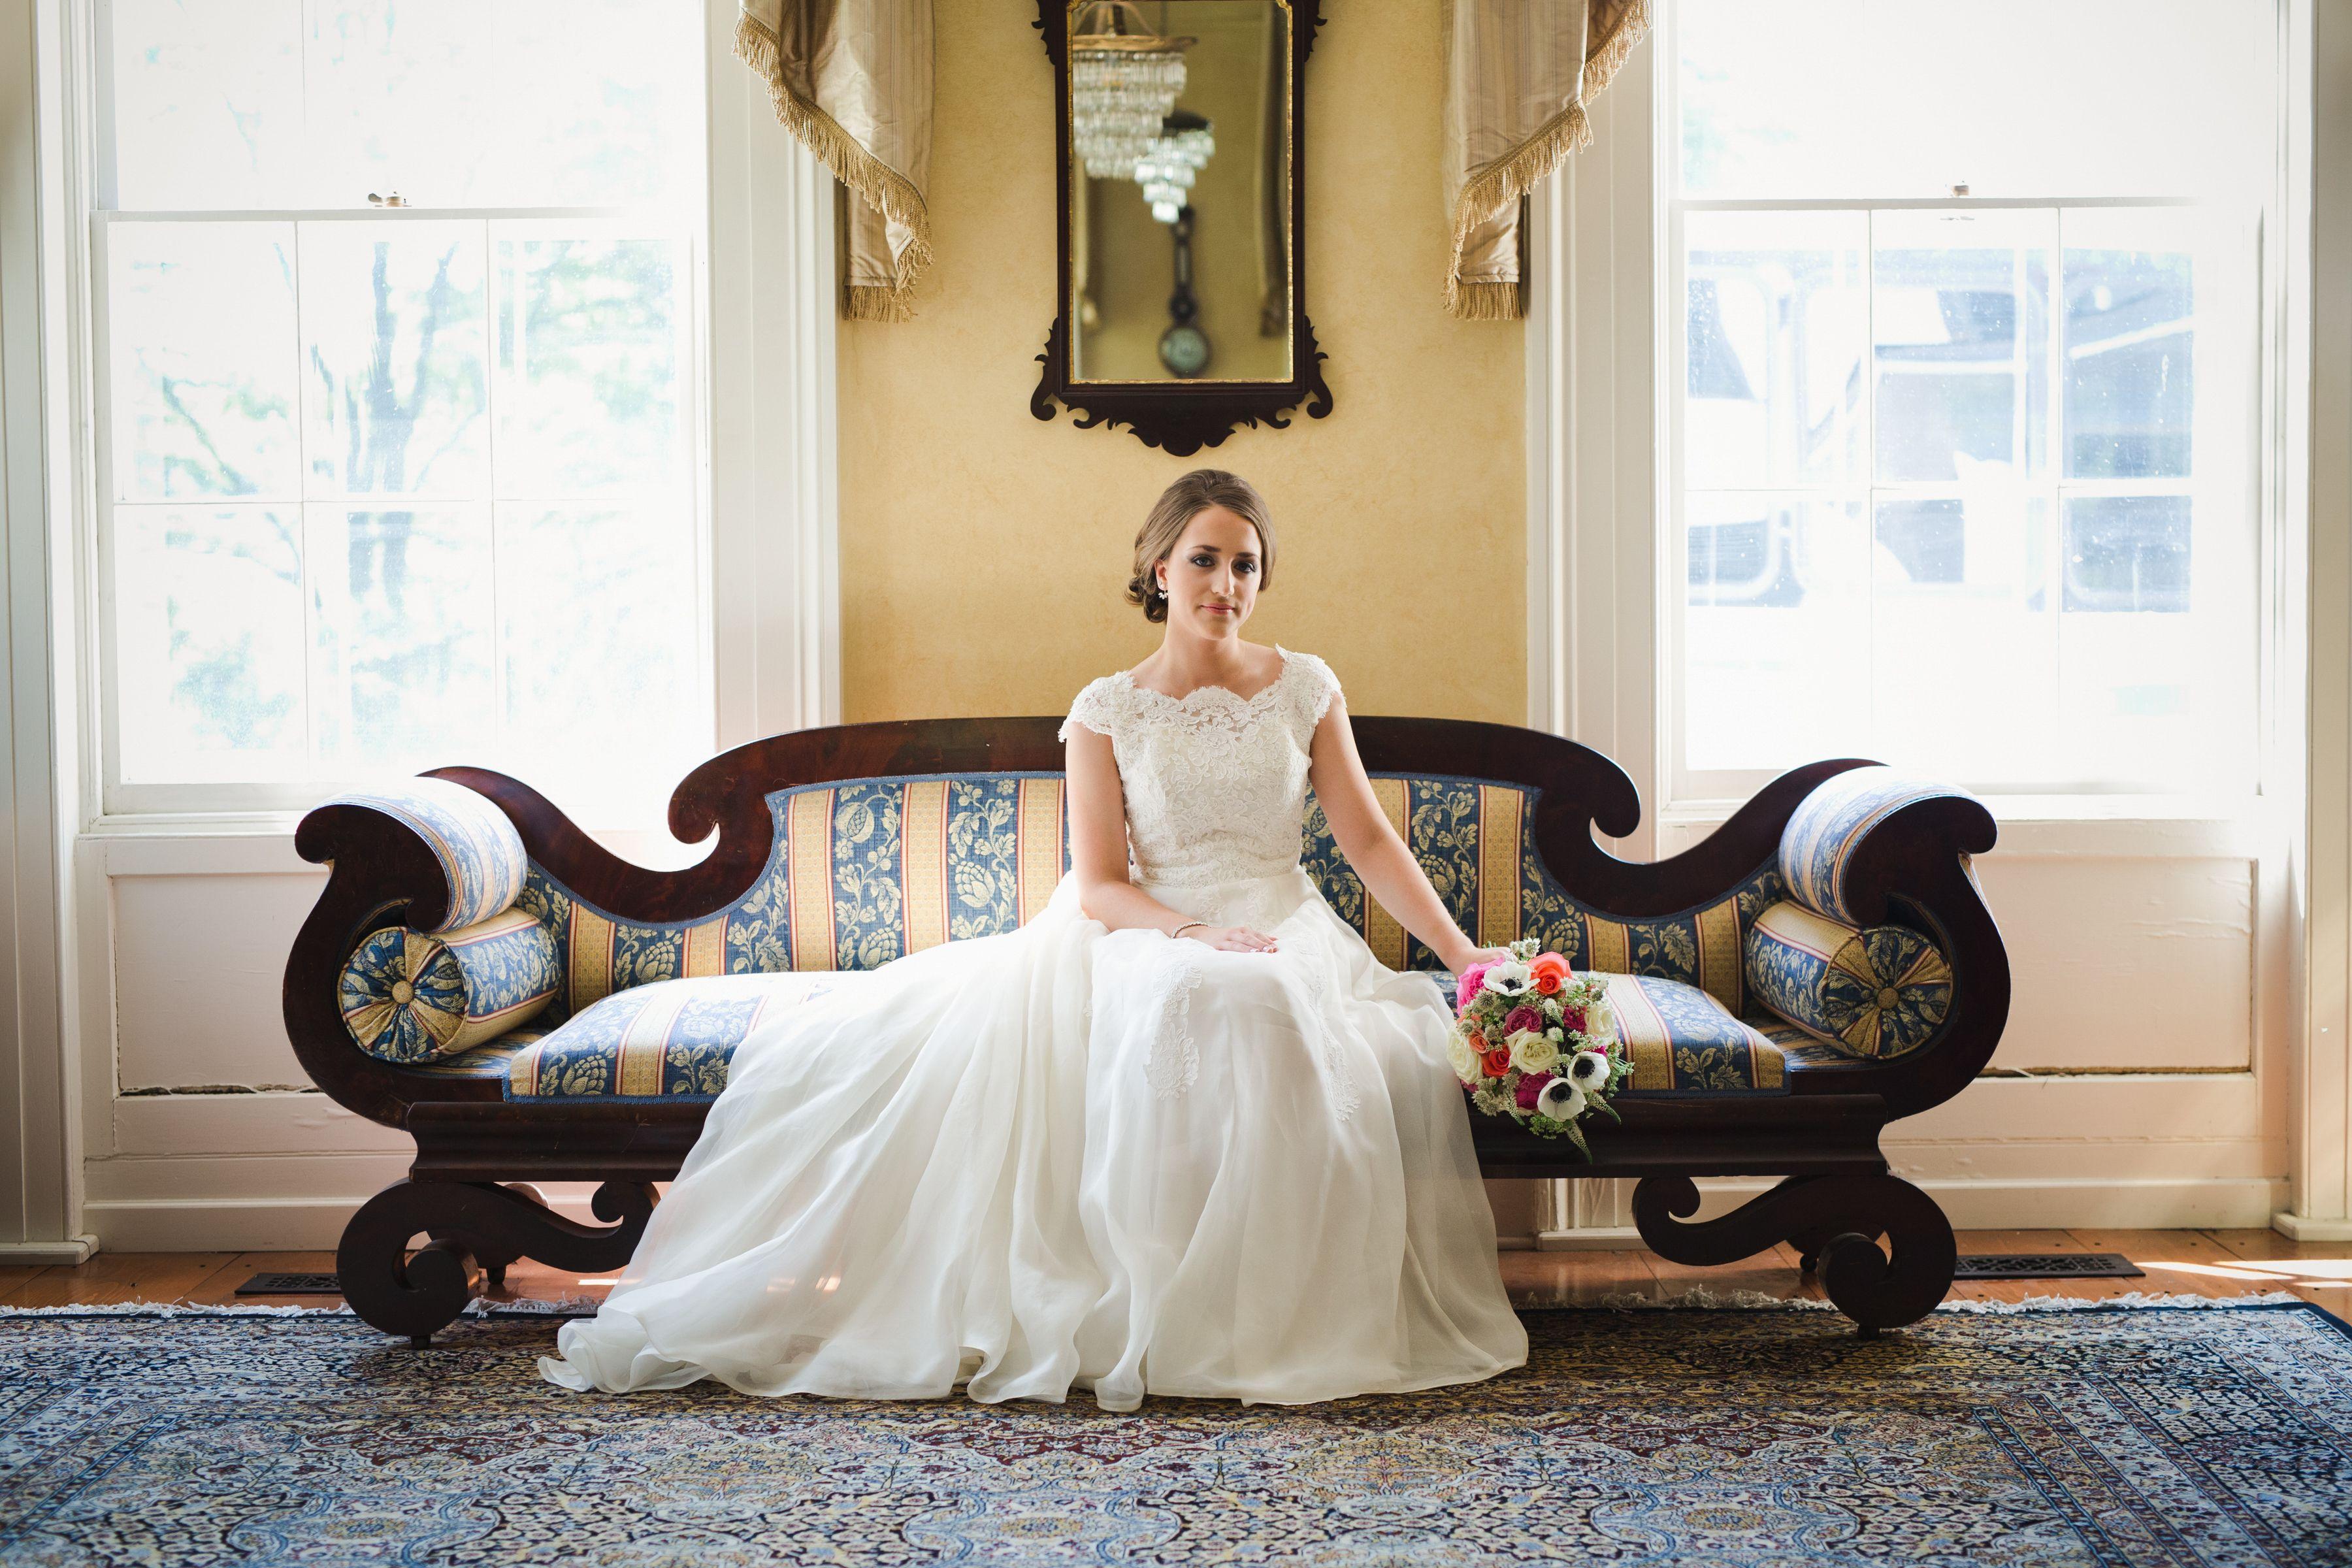 Pruyn House, Colonie NY, Albany NY, Barn Wedding, DIY ...